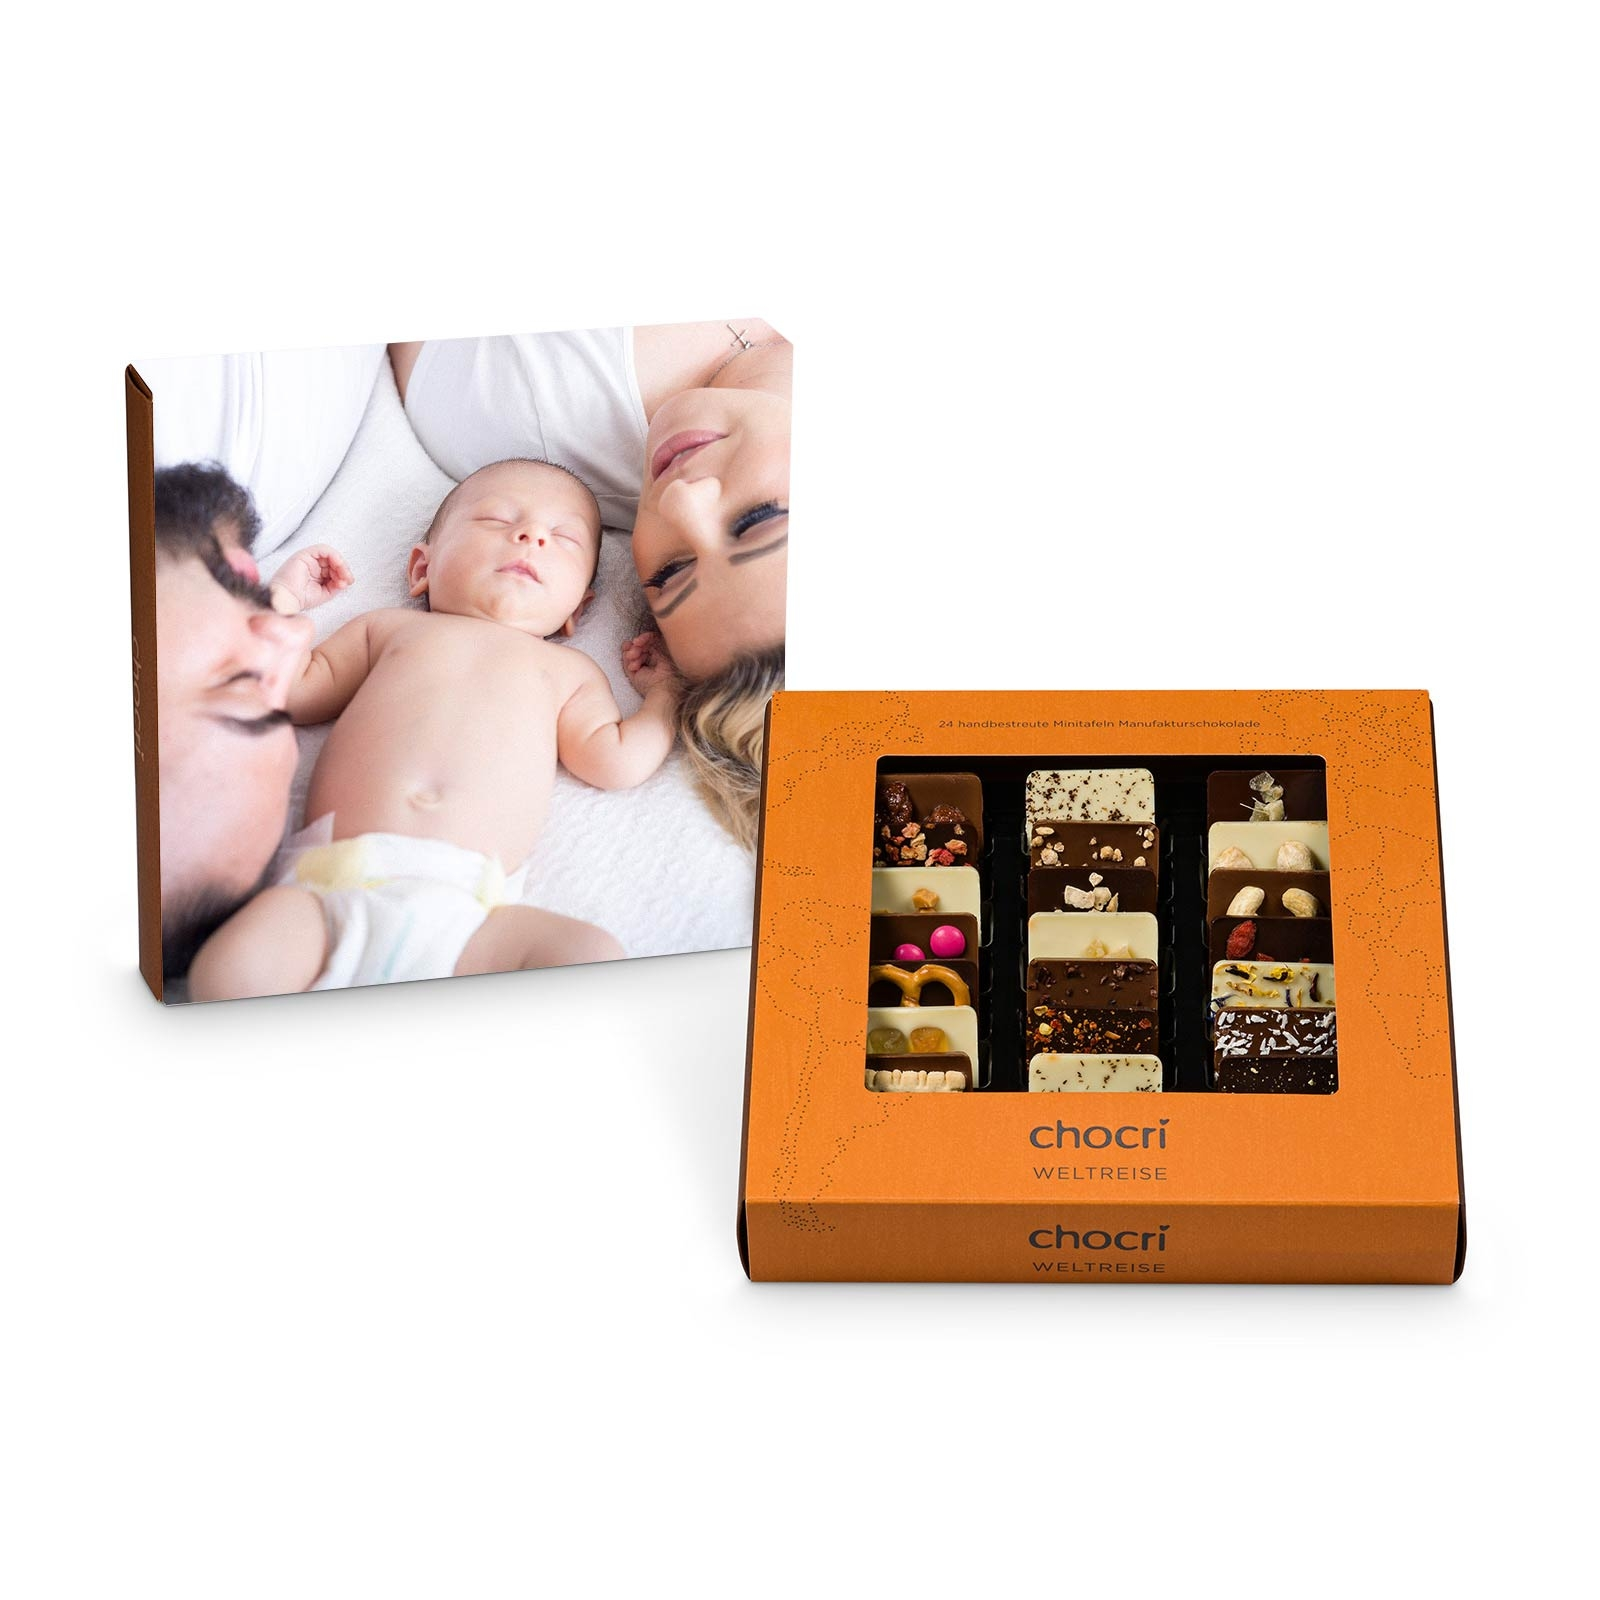 chocri Weltreise® 'Klassik' mit individueller Verpackung